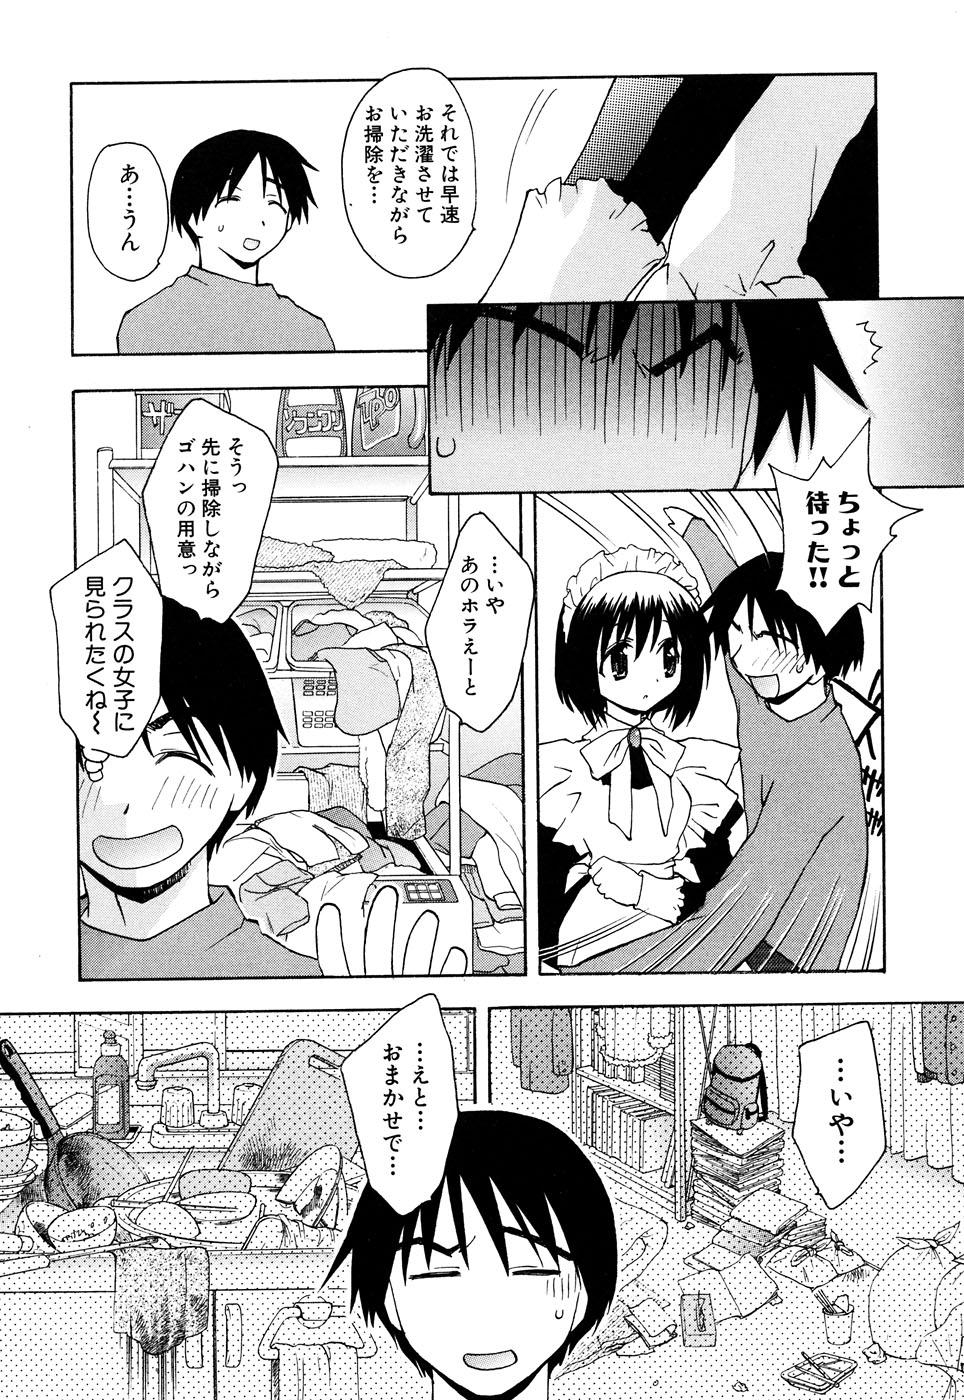 Fechikko VS Series ROUND.2 Miko San VS Maid San 90